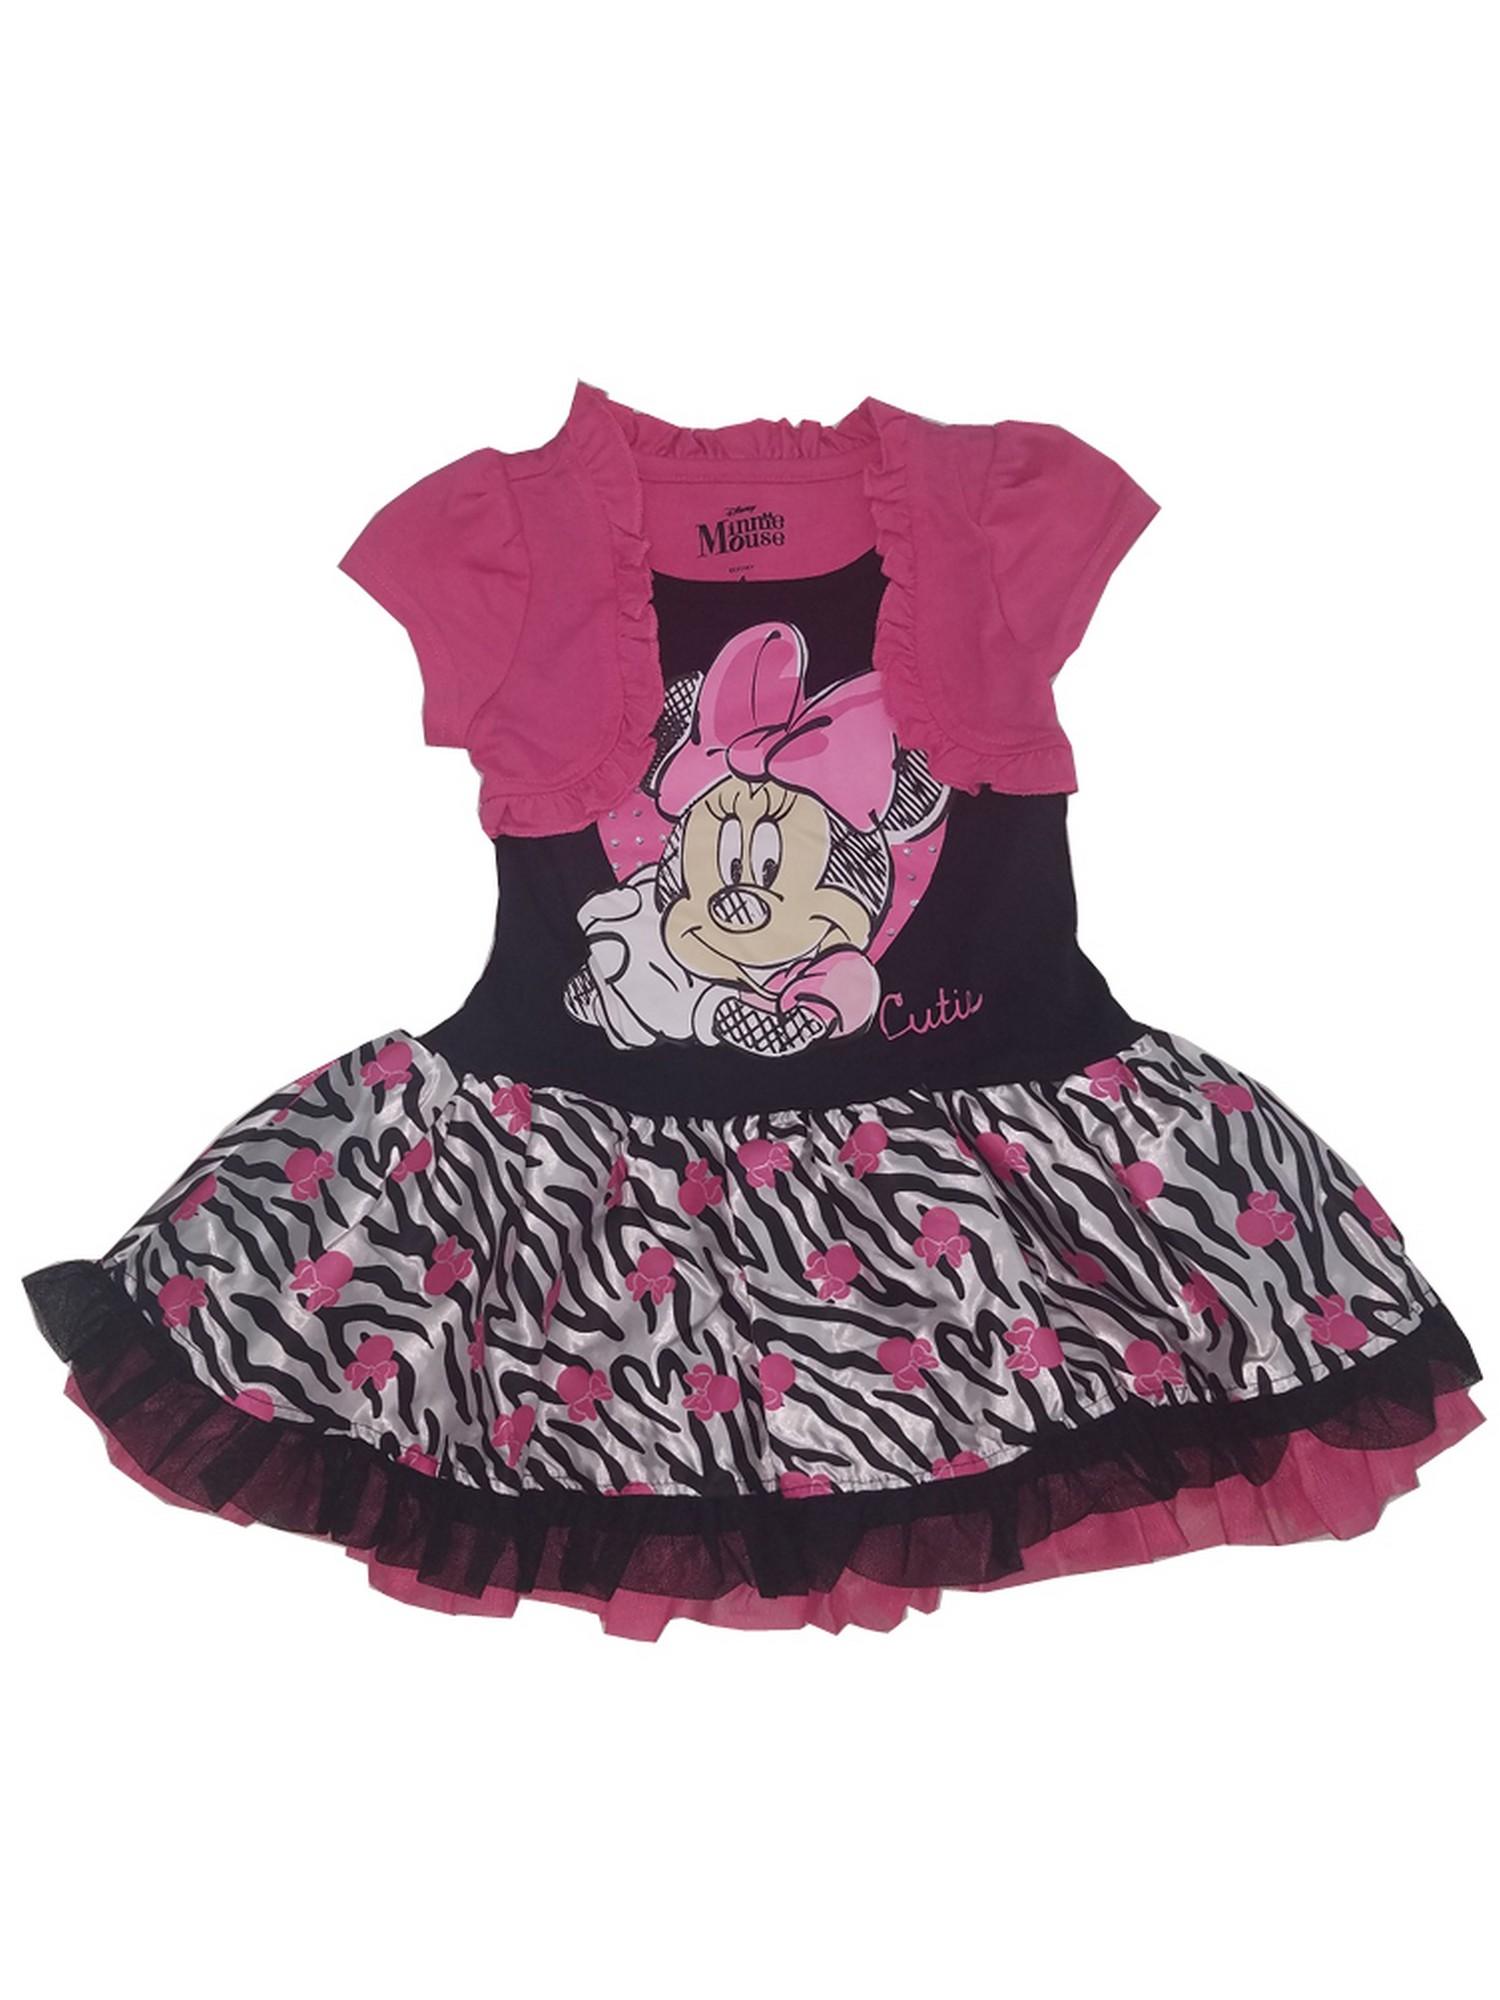 Minnie Mouse Ribbon trim Tutu with matching hair bows ~ fuchsia color